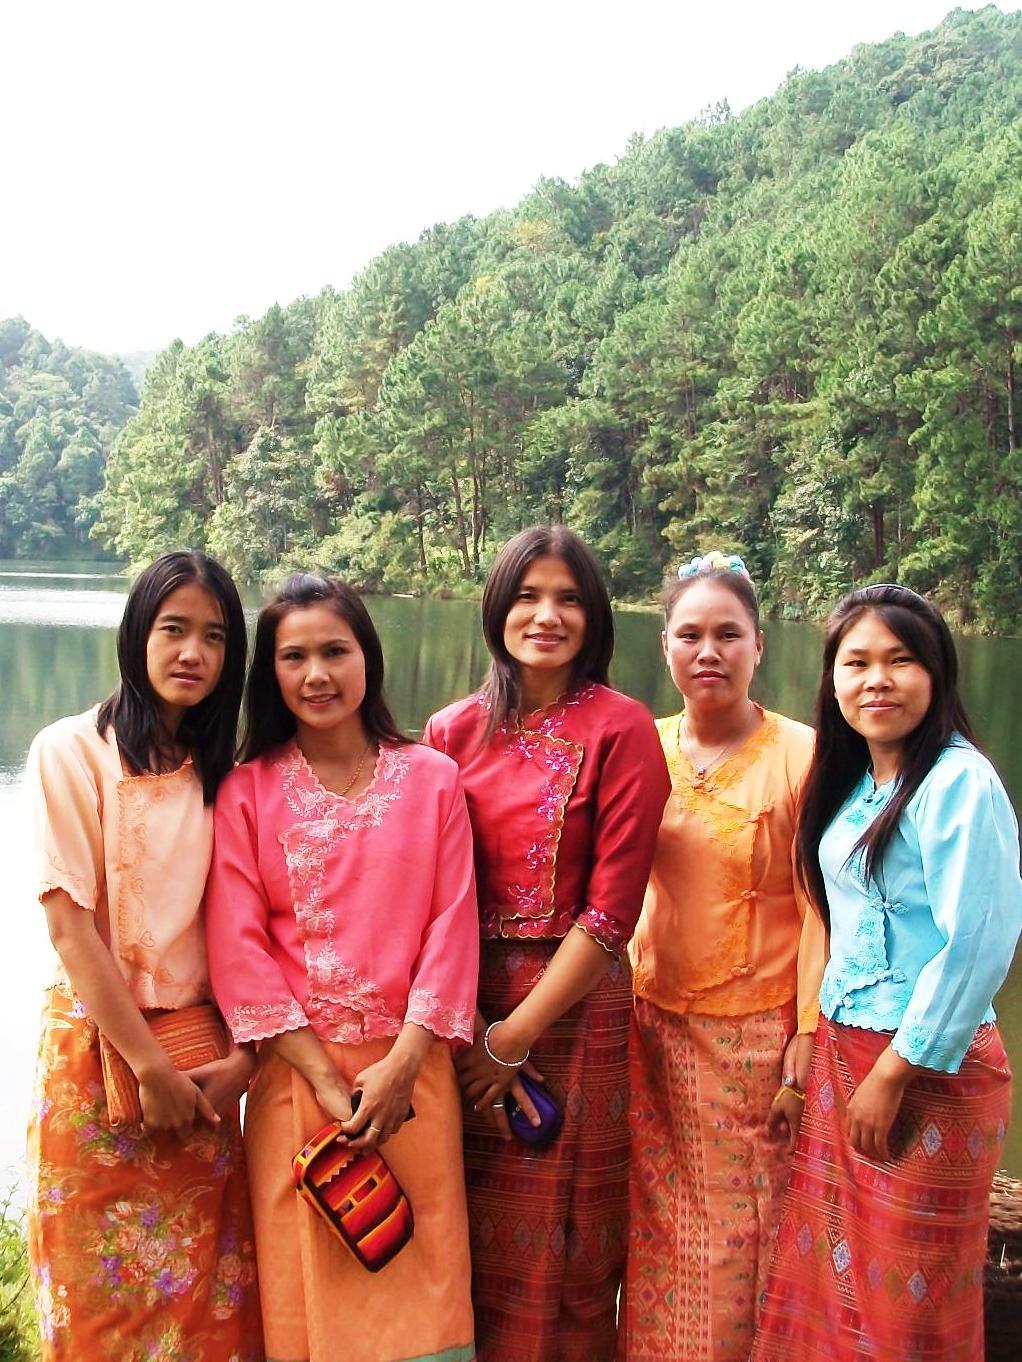 Shan klederdracht